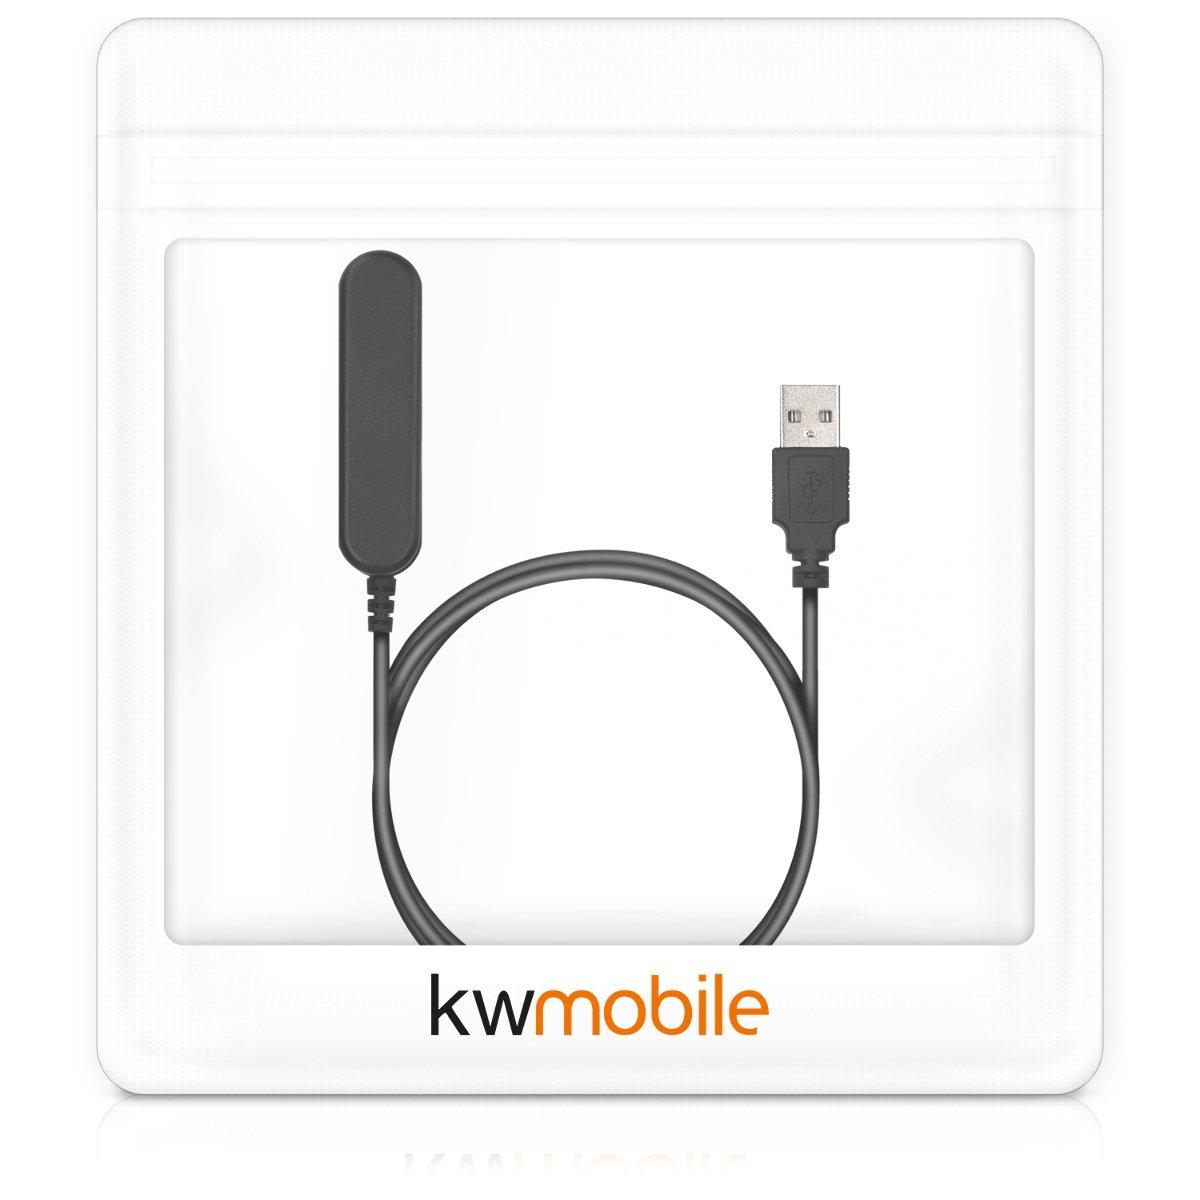 kwmobile Cable de Carga para Polar V800 - Conector USB Negro para Fitness Tracker y smartwatch